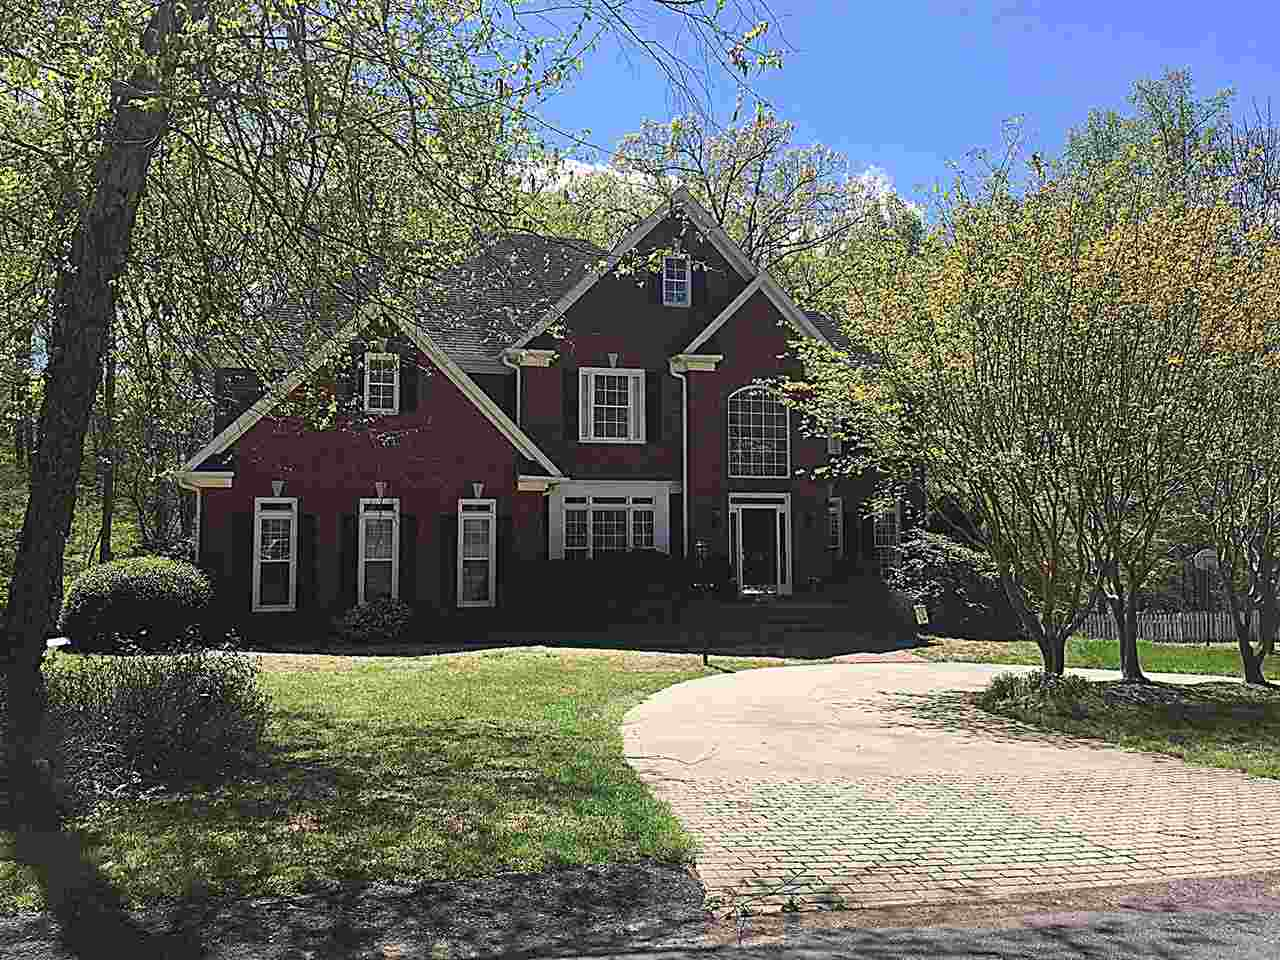 Real Estate for Sale, ListingId: 36650185, Clemson,SC29631